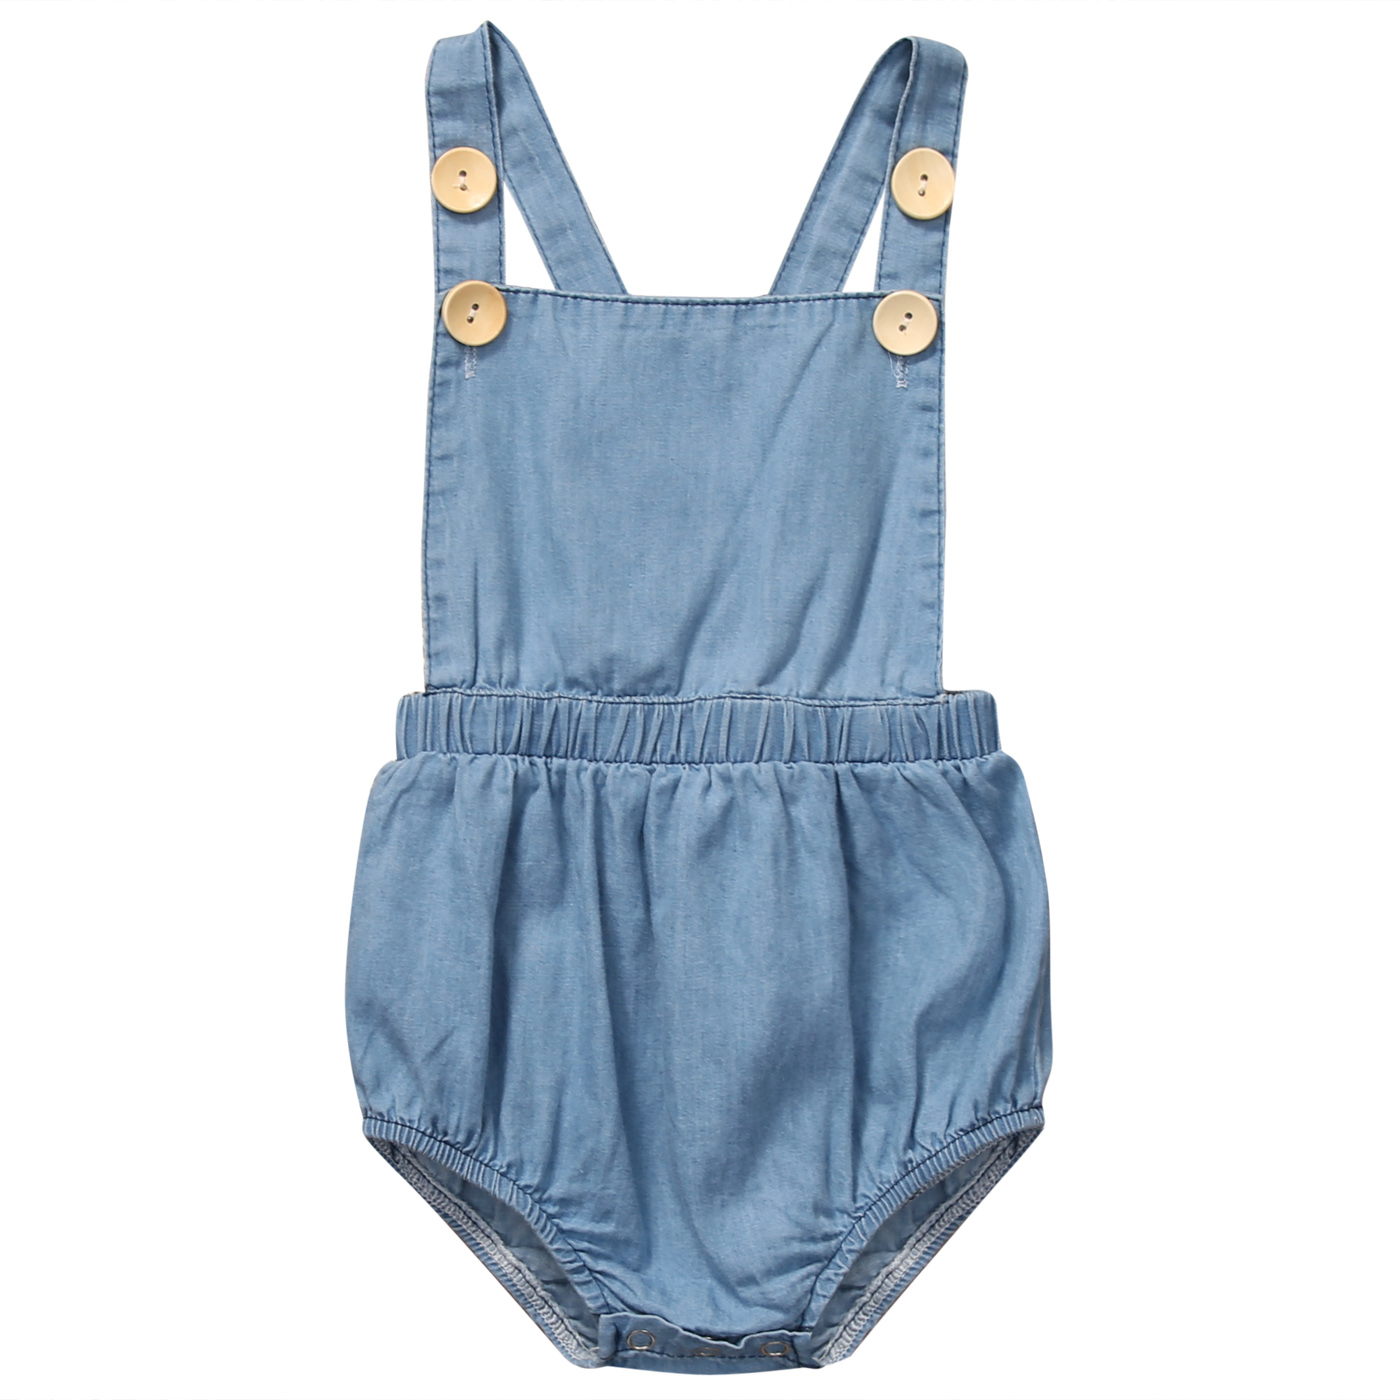 HOT Summer Jumper Romper Newborn Baby Girl Denim Jumpsuit Sleeveless Outfits Infant Kid Girl Sunsuit Clothes